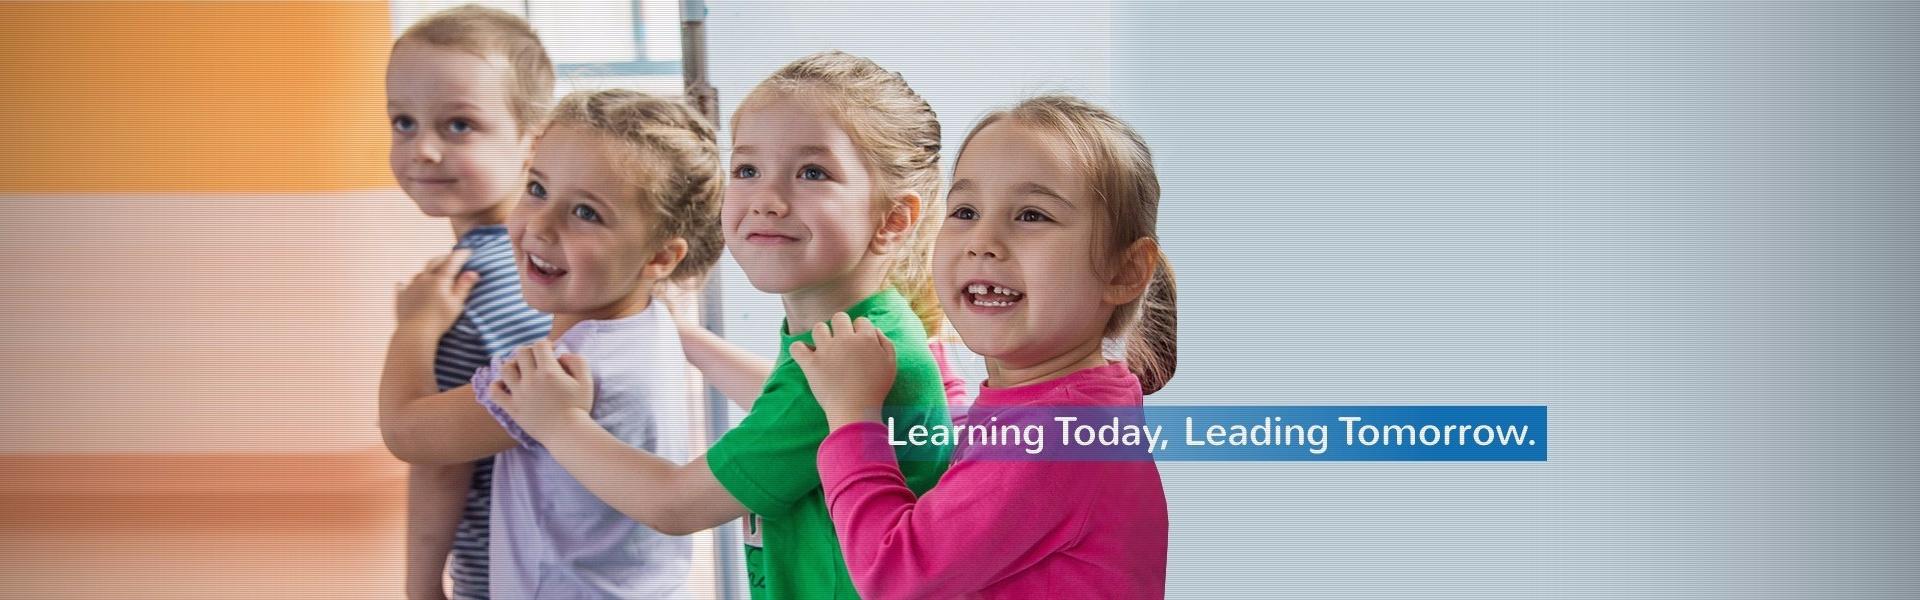 Child Care Educational Preschool Program Sydney Group